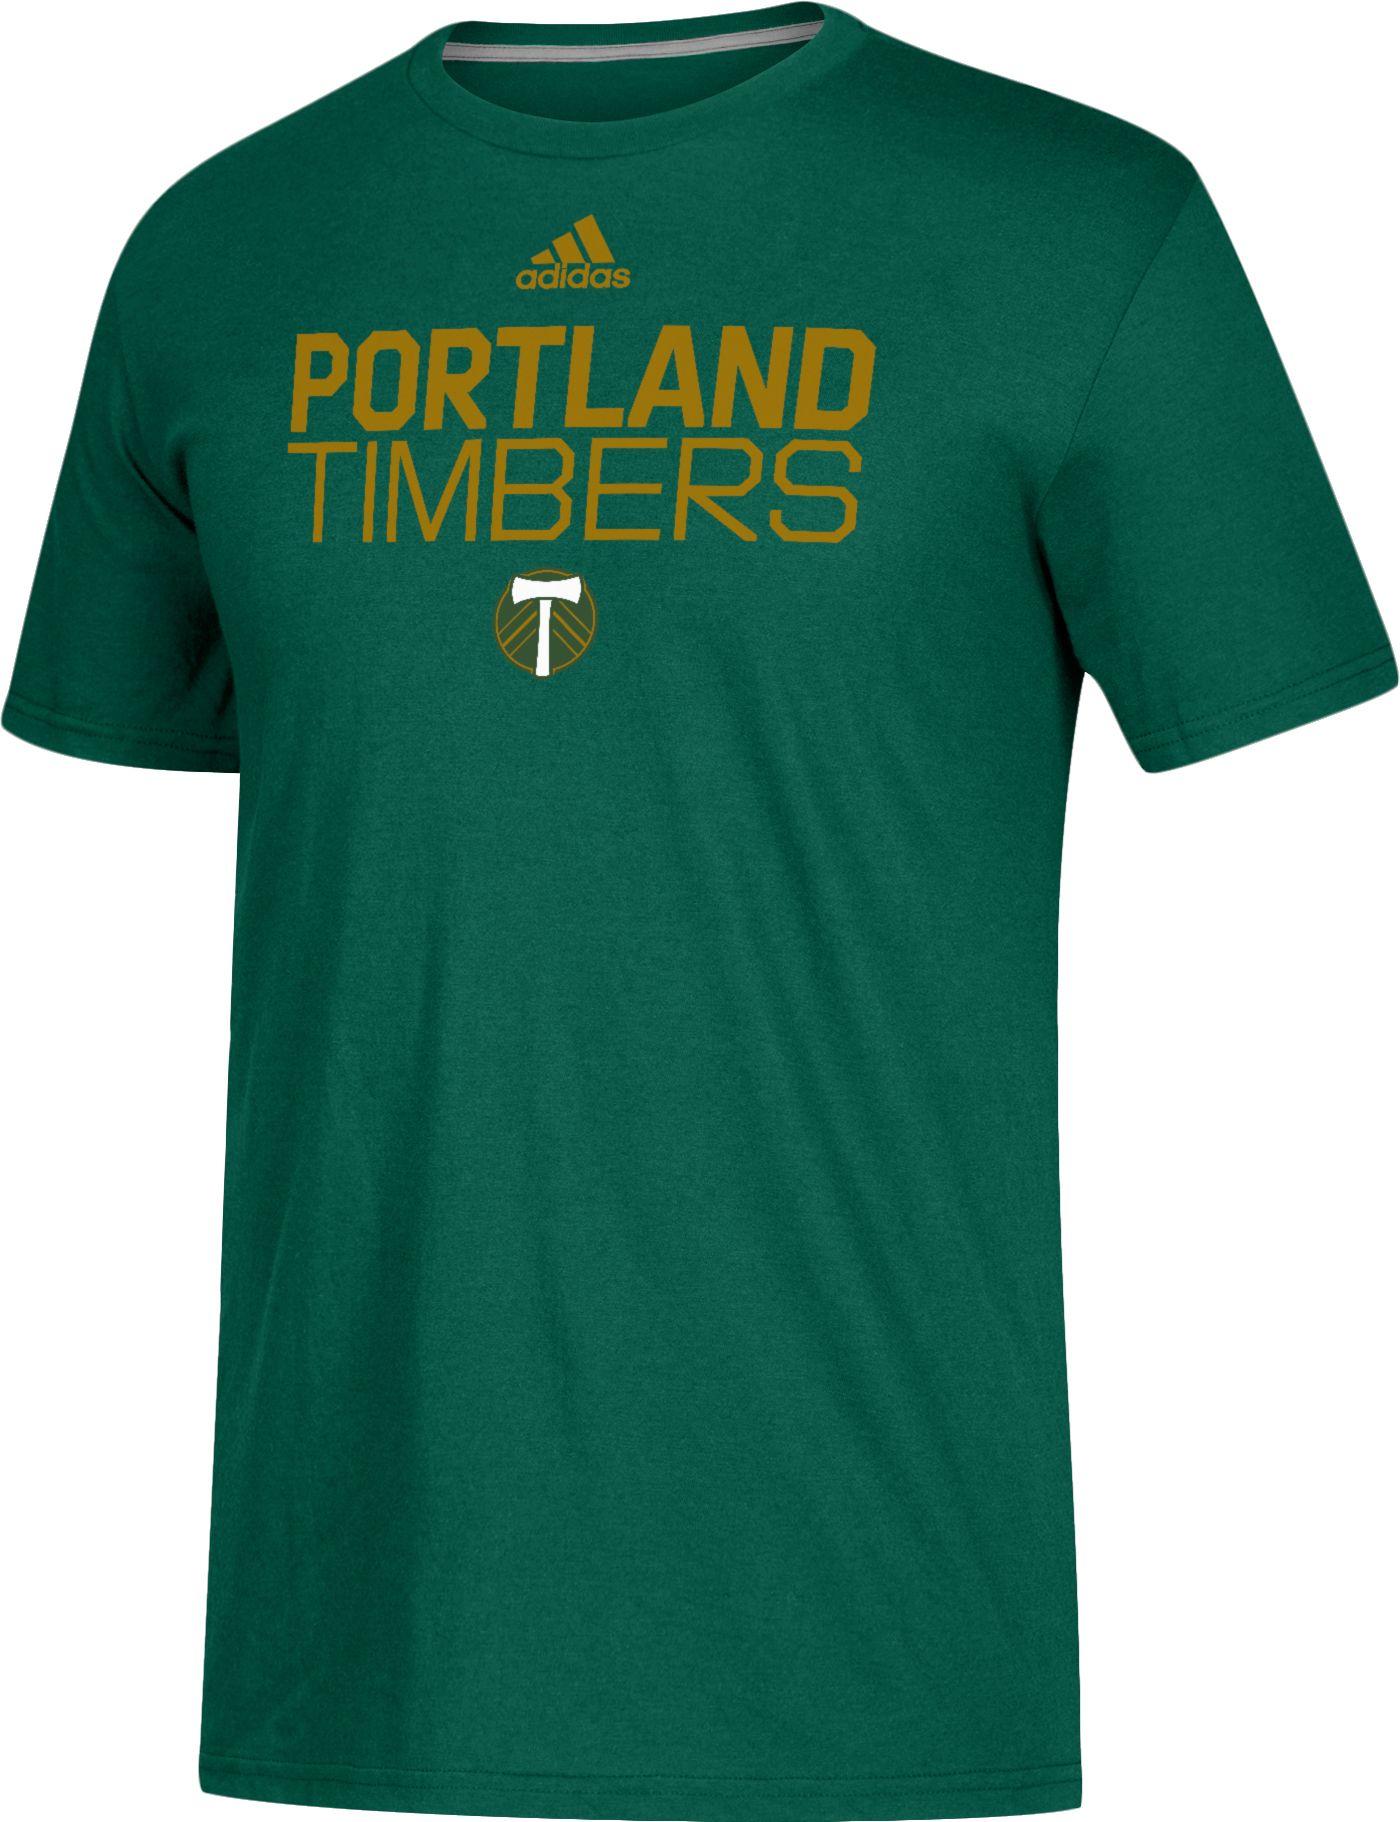 adidas Men's Portland Timbers Logo Green Performance T-Shirt